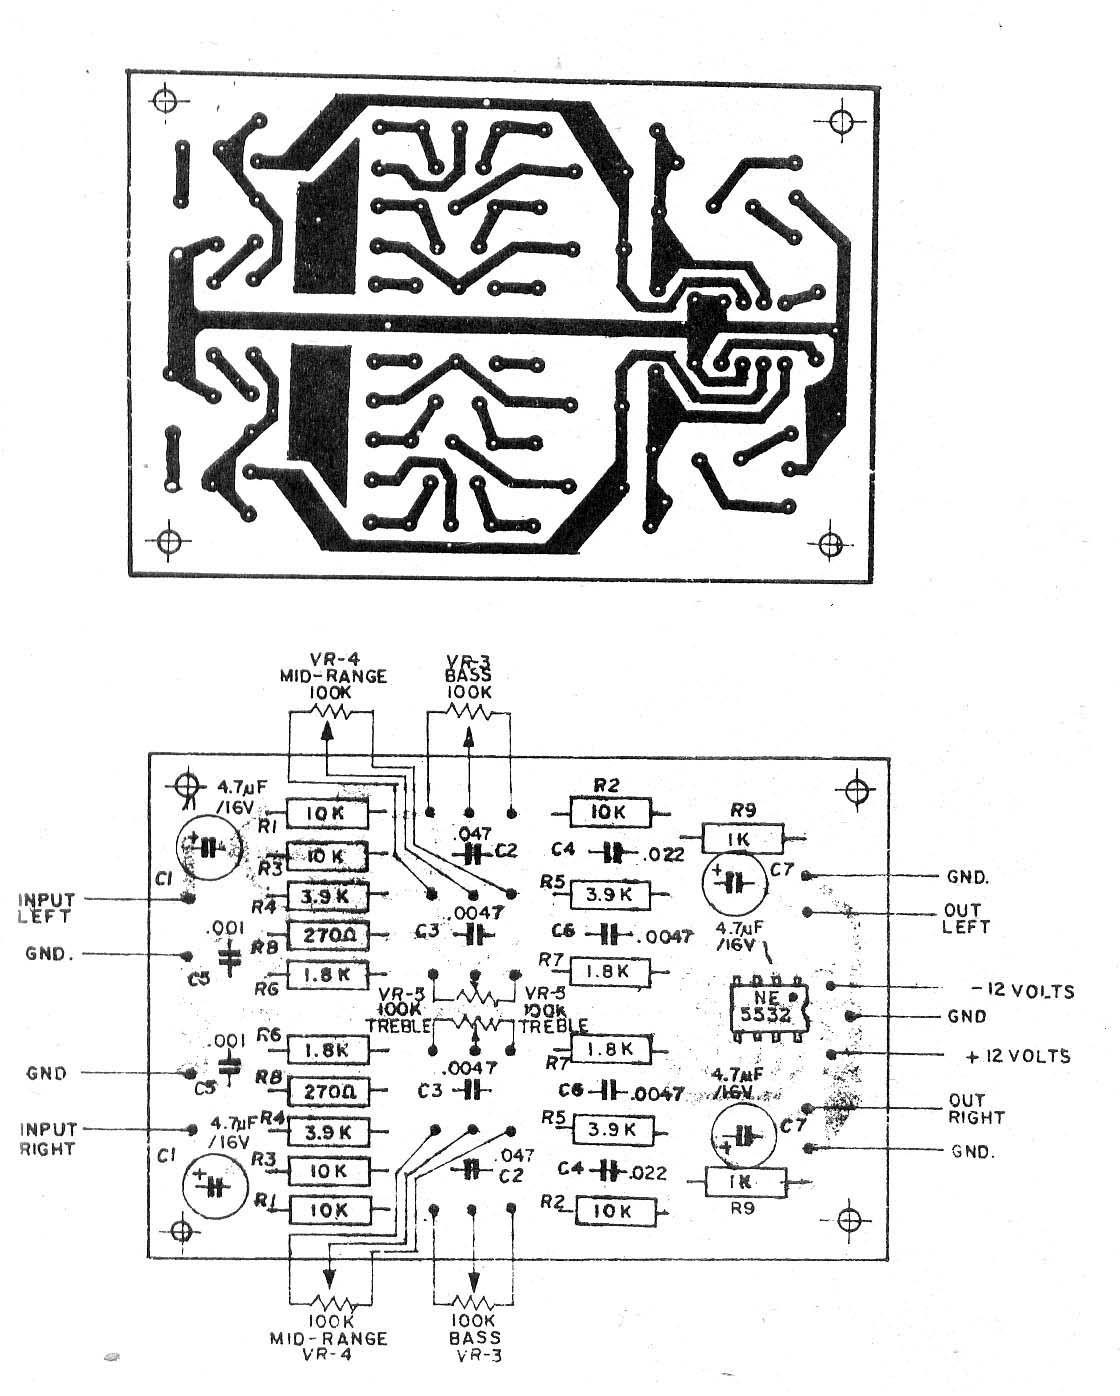 Marvelous Wrg 7963 Bass Treble Circuit Diagram 4558 Wiring Cloud Grayisramohammedshrineorg